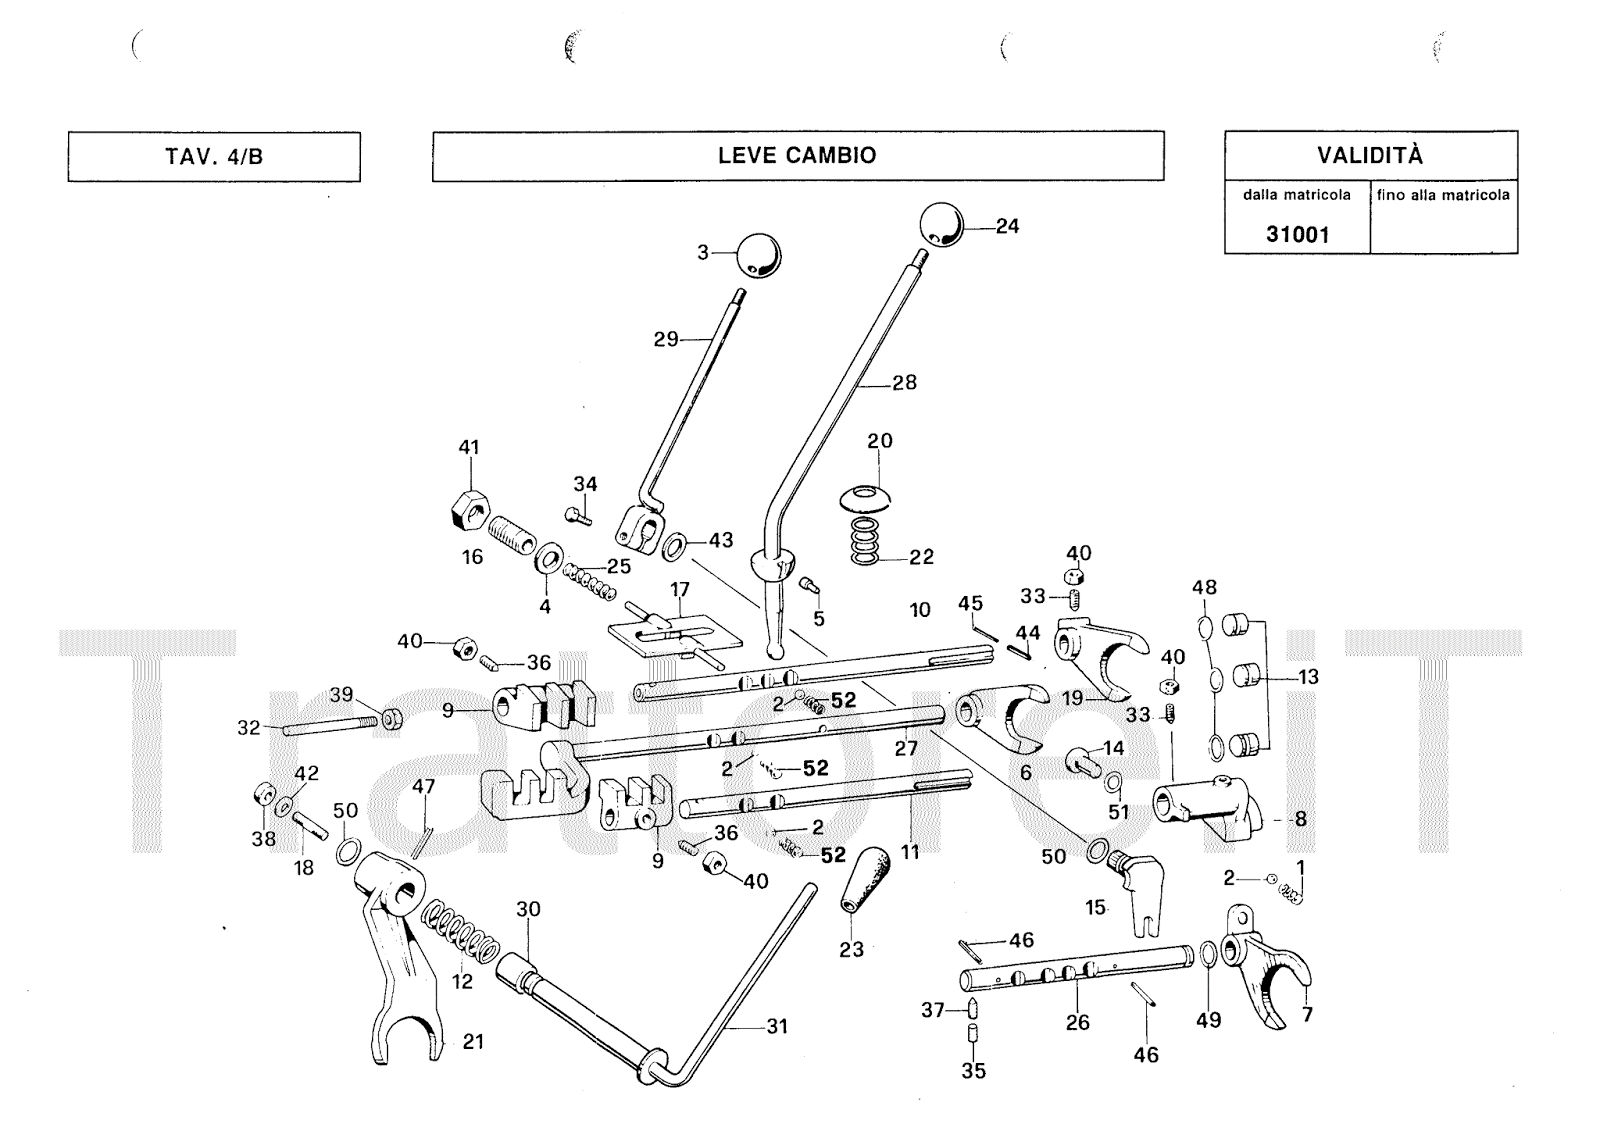 InfoTrattore.it: Manuale (esploso meccanico) Motoagricola